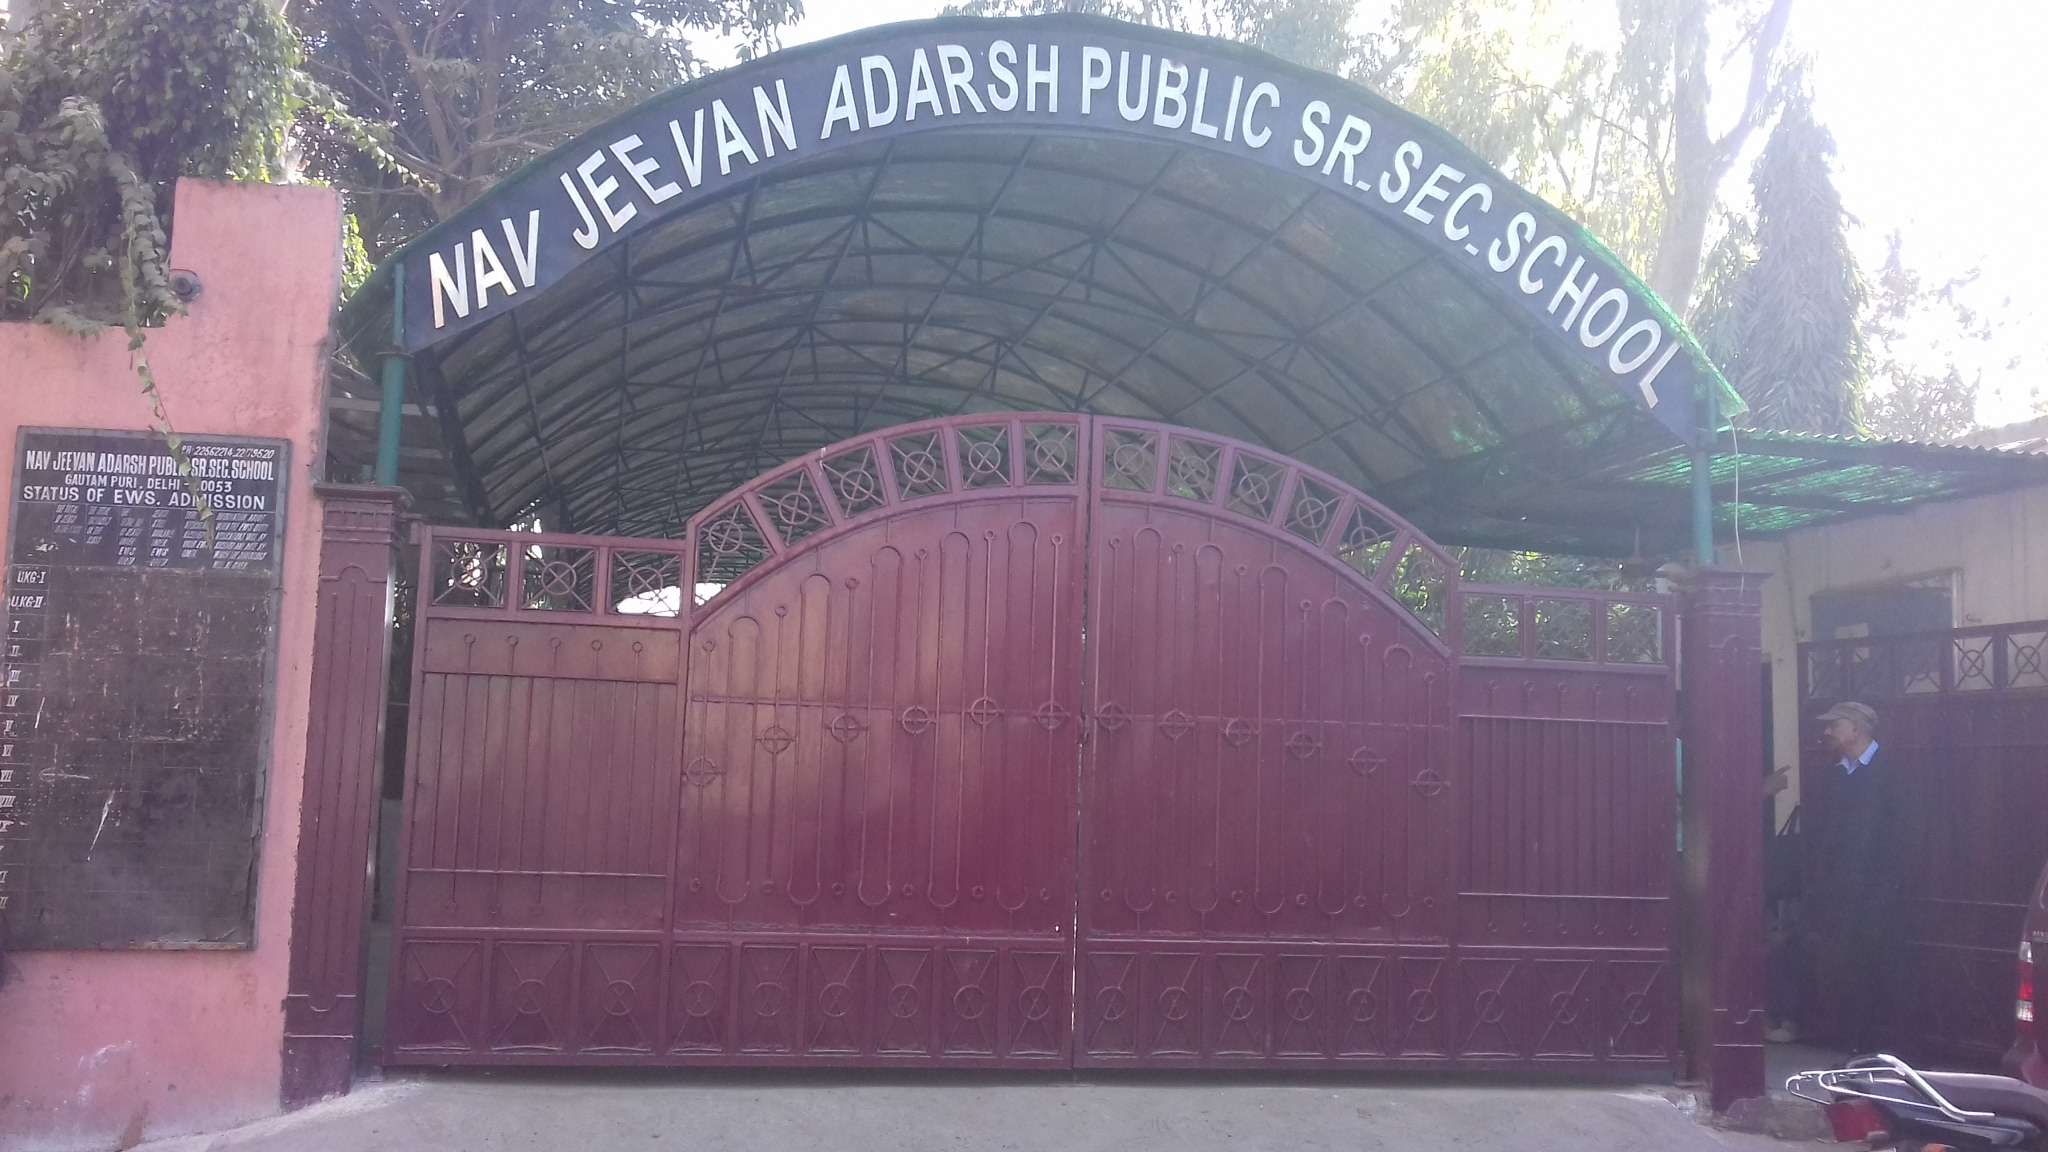 NAVJEEVAN ADARSH PUBLIC SCHOOL GALI NO 8 GAUTAM PURI DELHI 2730209